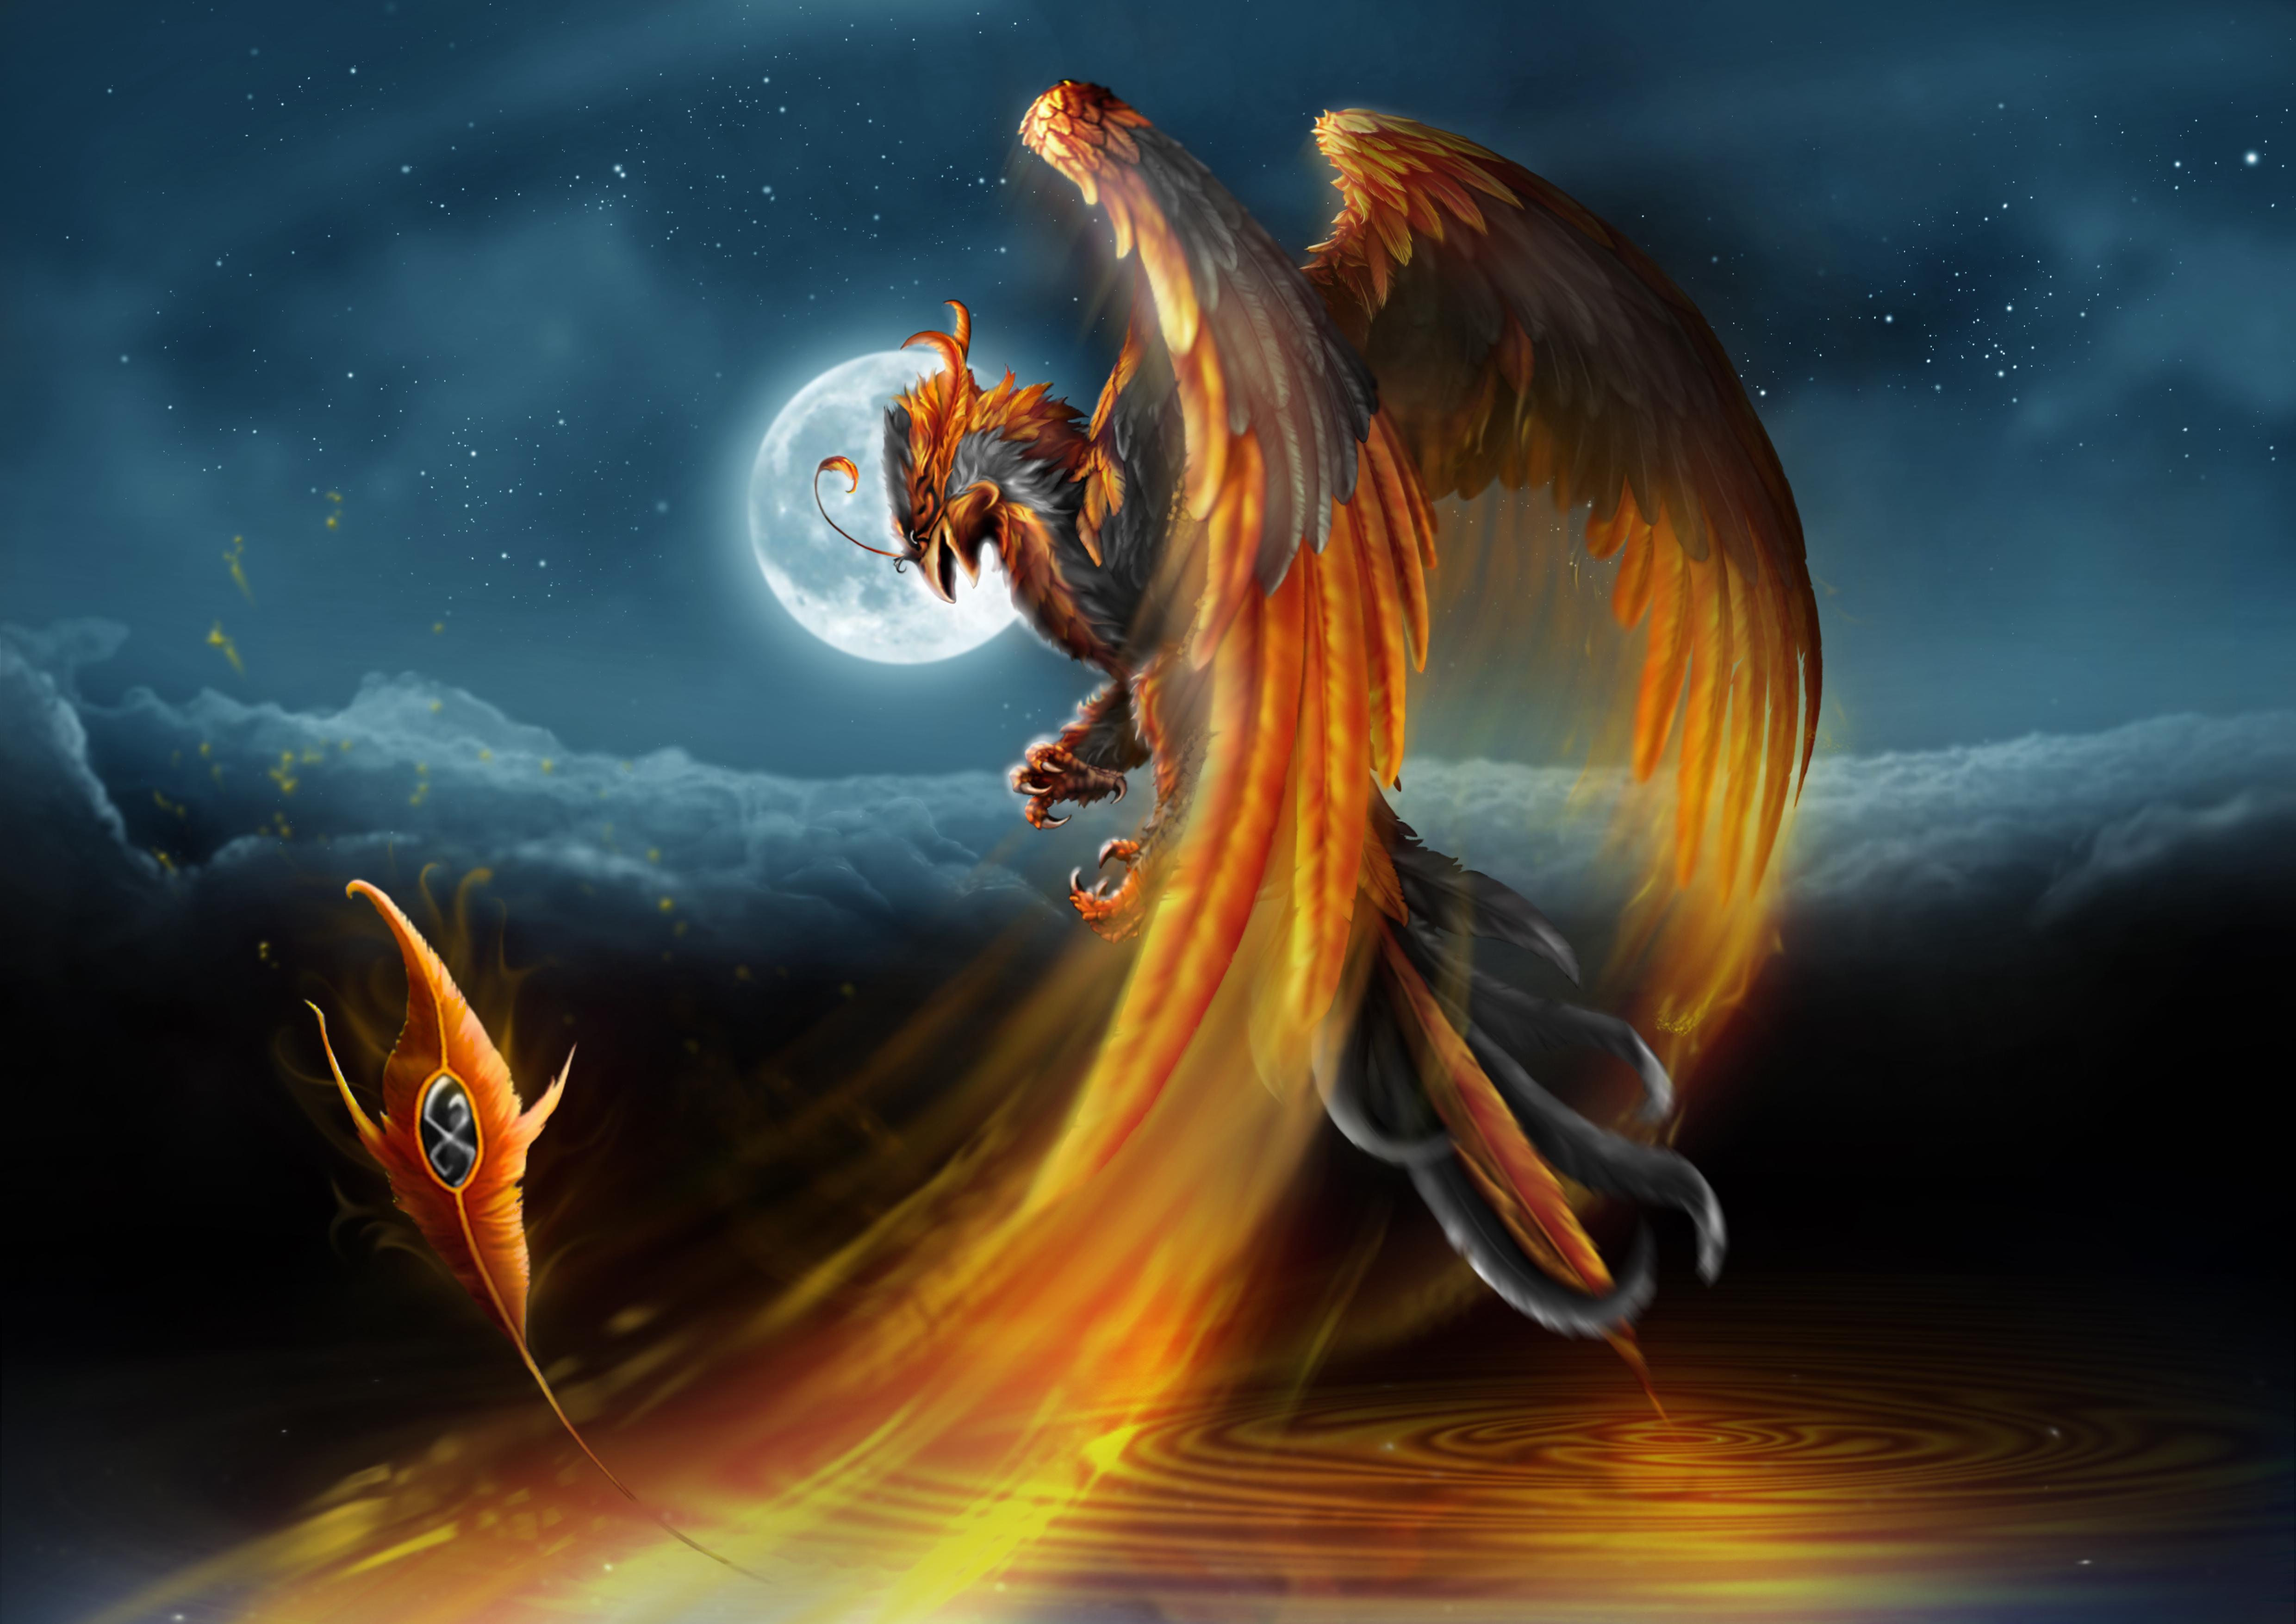 Painting Art Phoenix Fire Fantasy Digital Drawing: Phoenix By Guillaume-phoenix On DeviantArt